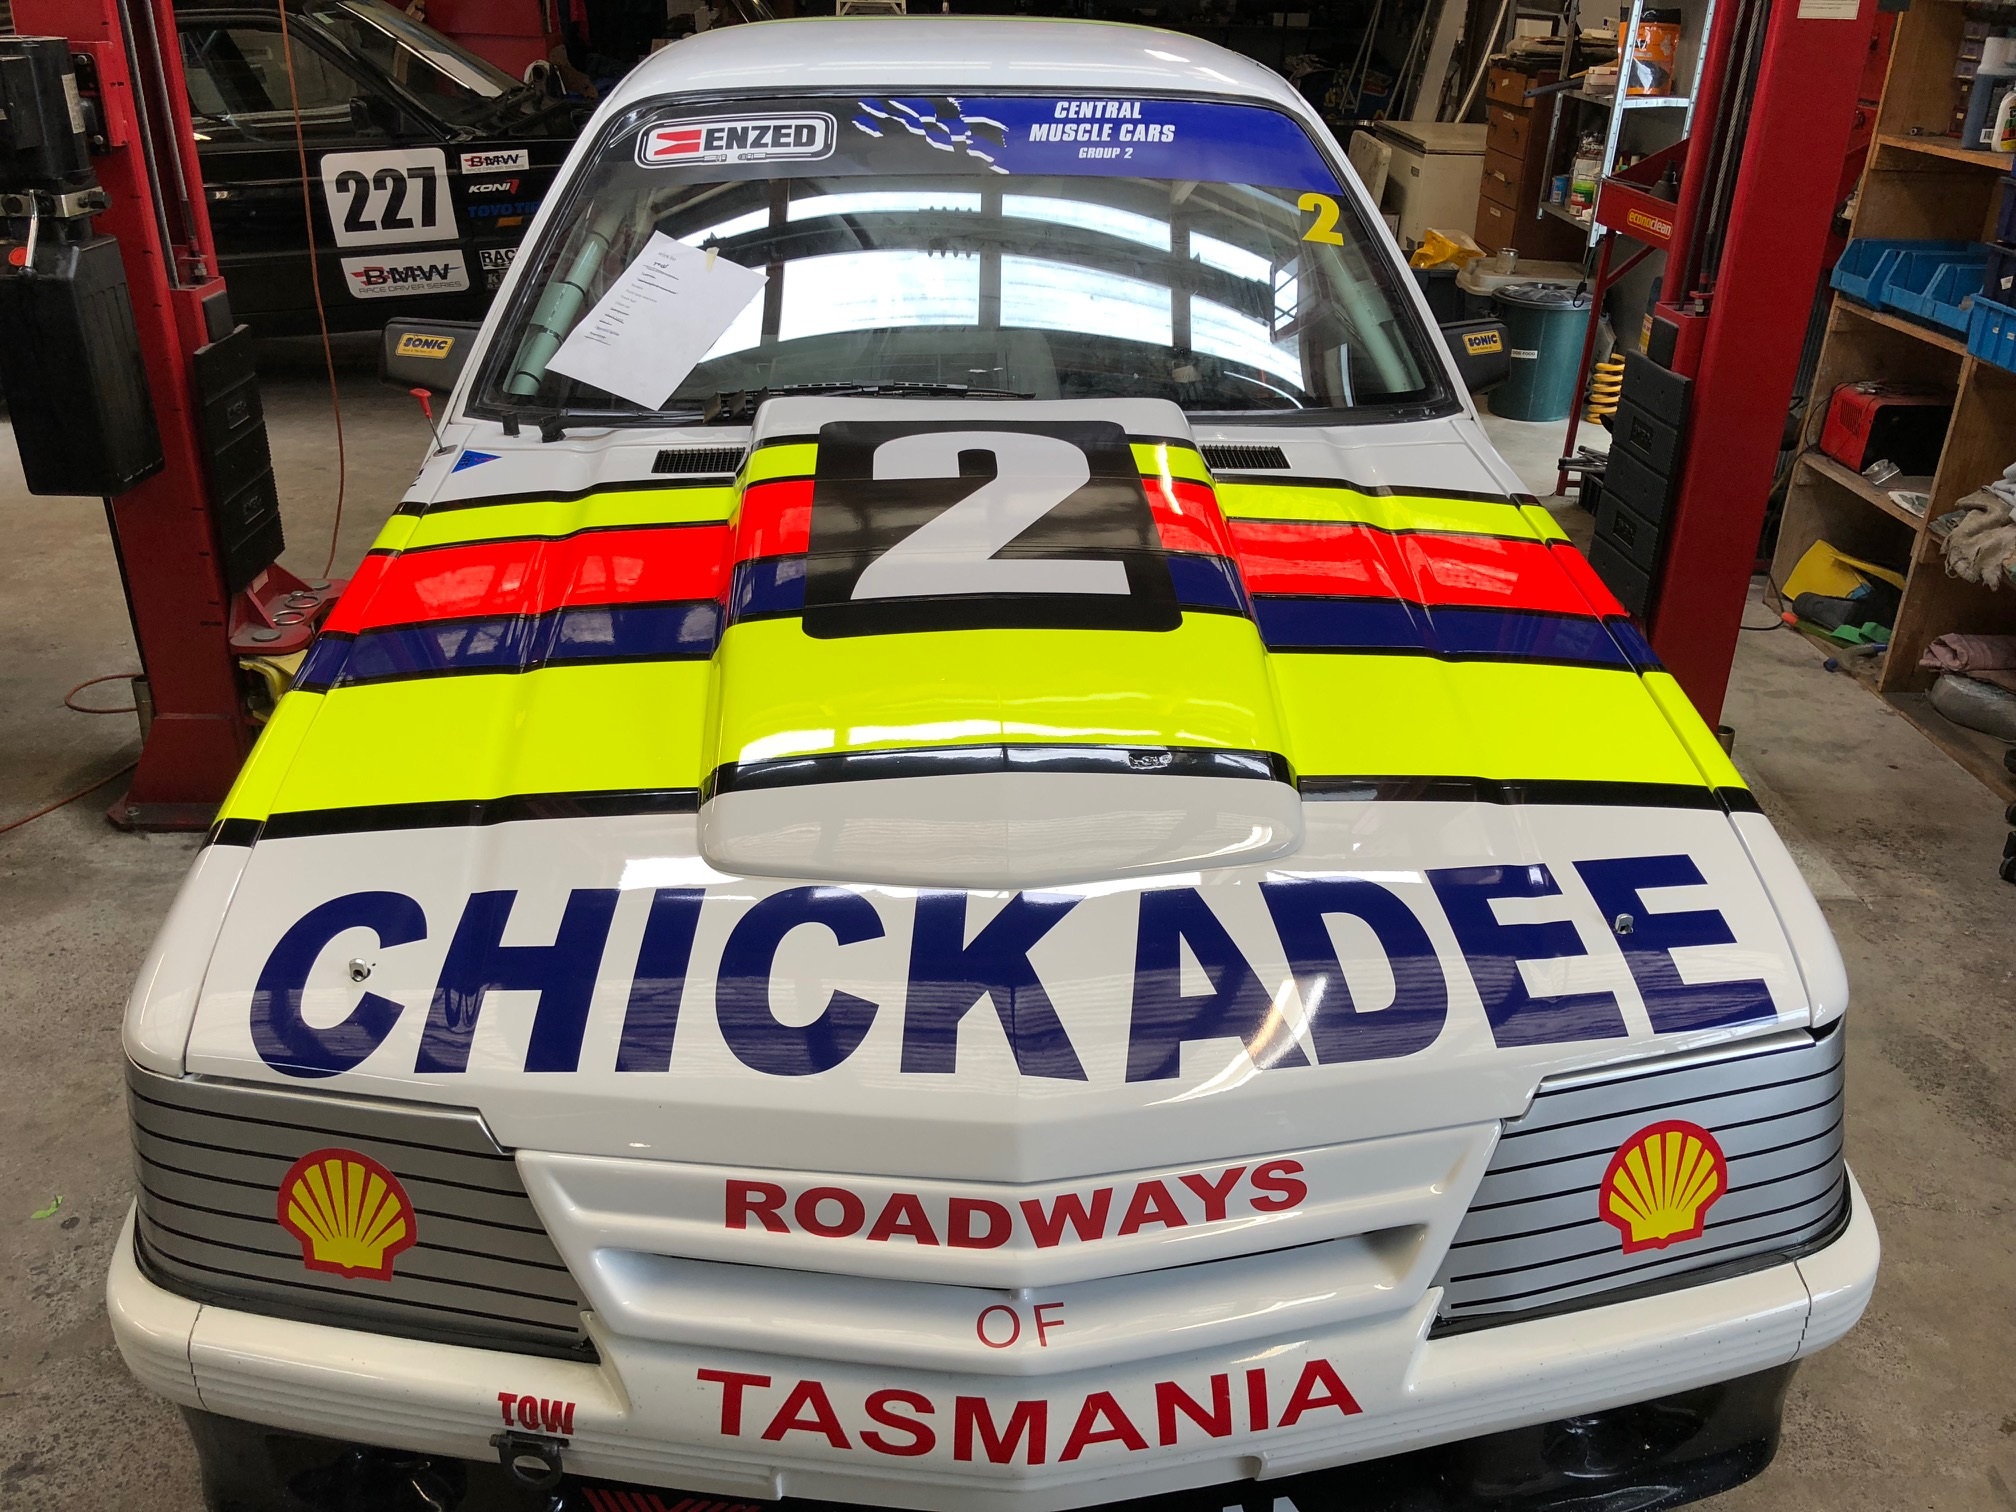 Racecar - chickadee front